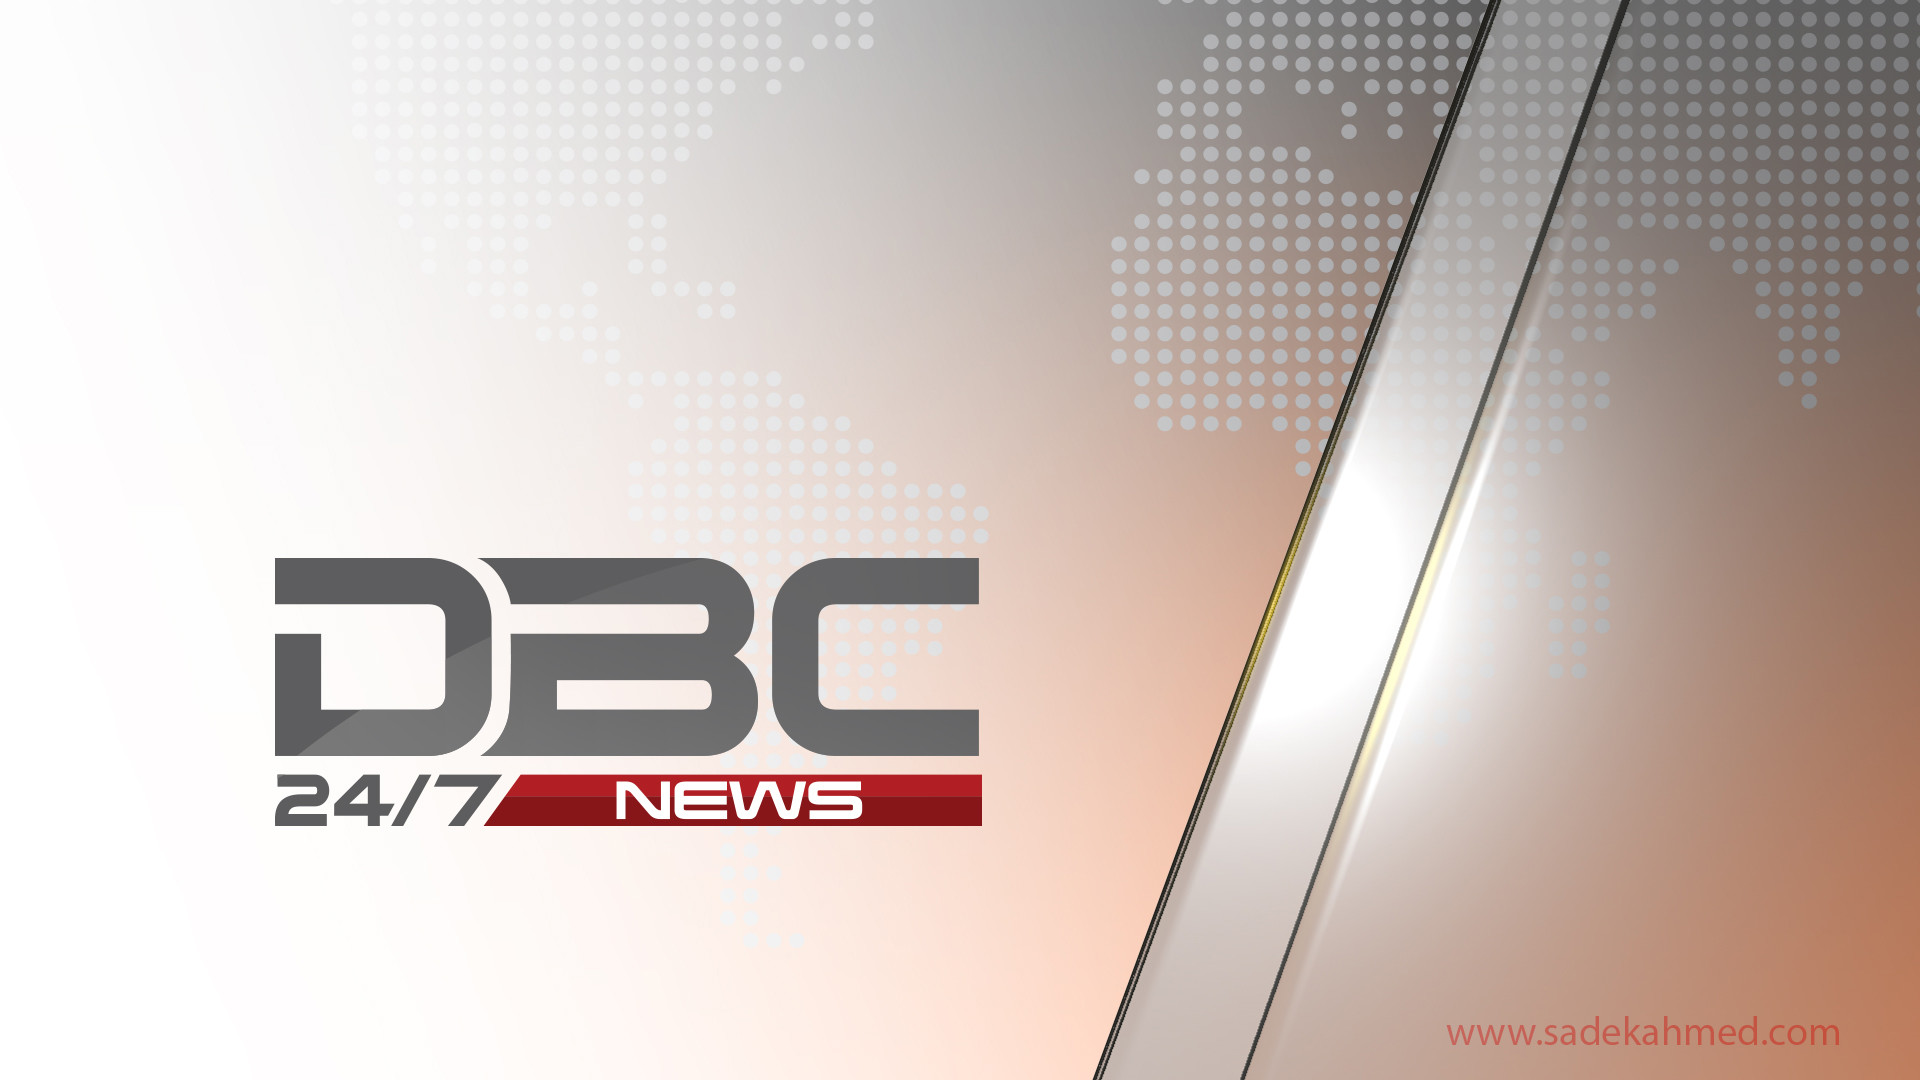 ArtStation - DBC NEWS 24/7 | LIVE | SATELLITE NEWS CHANNEL